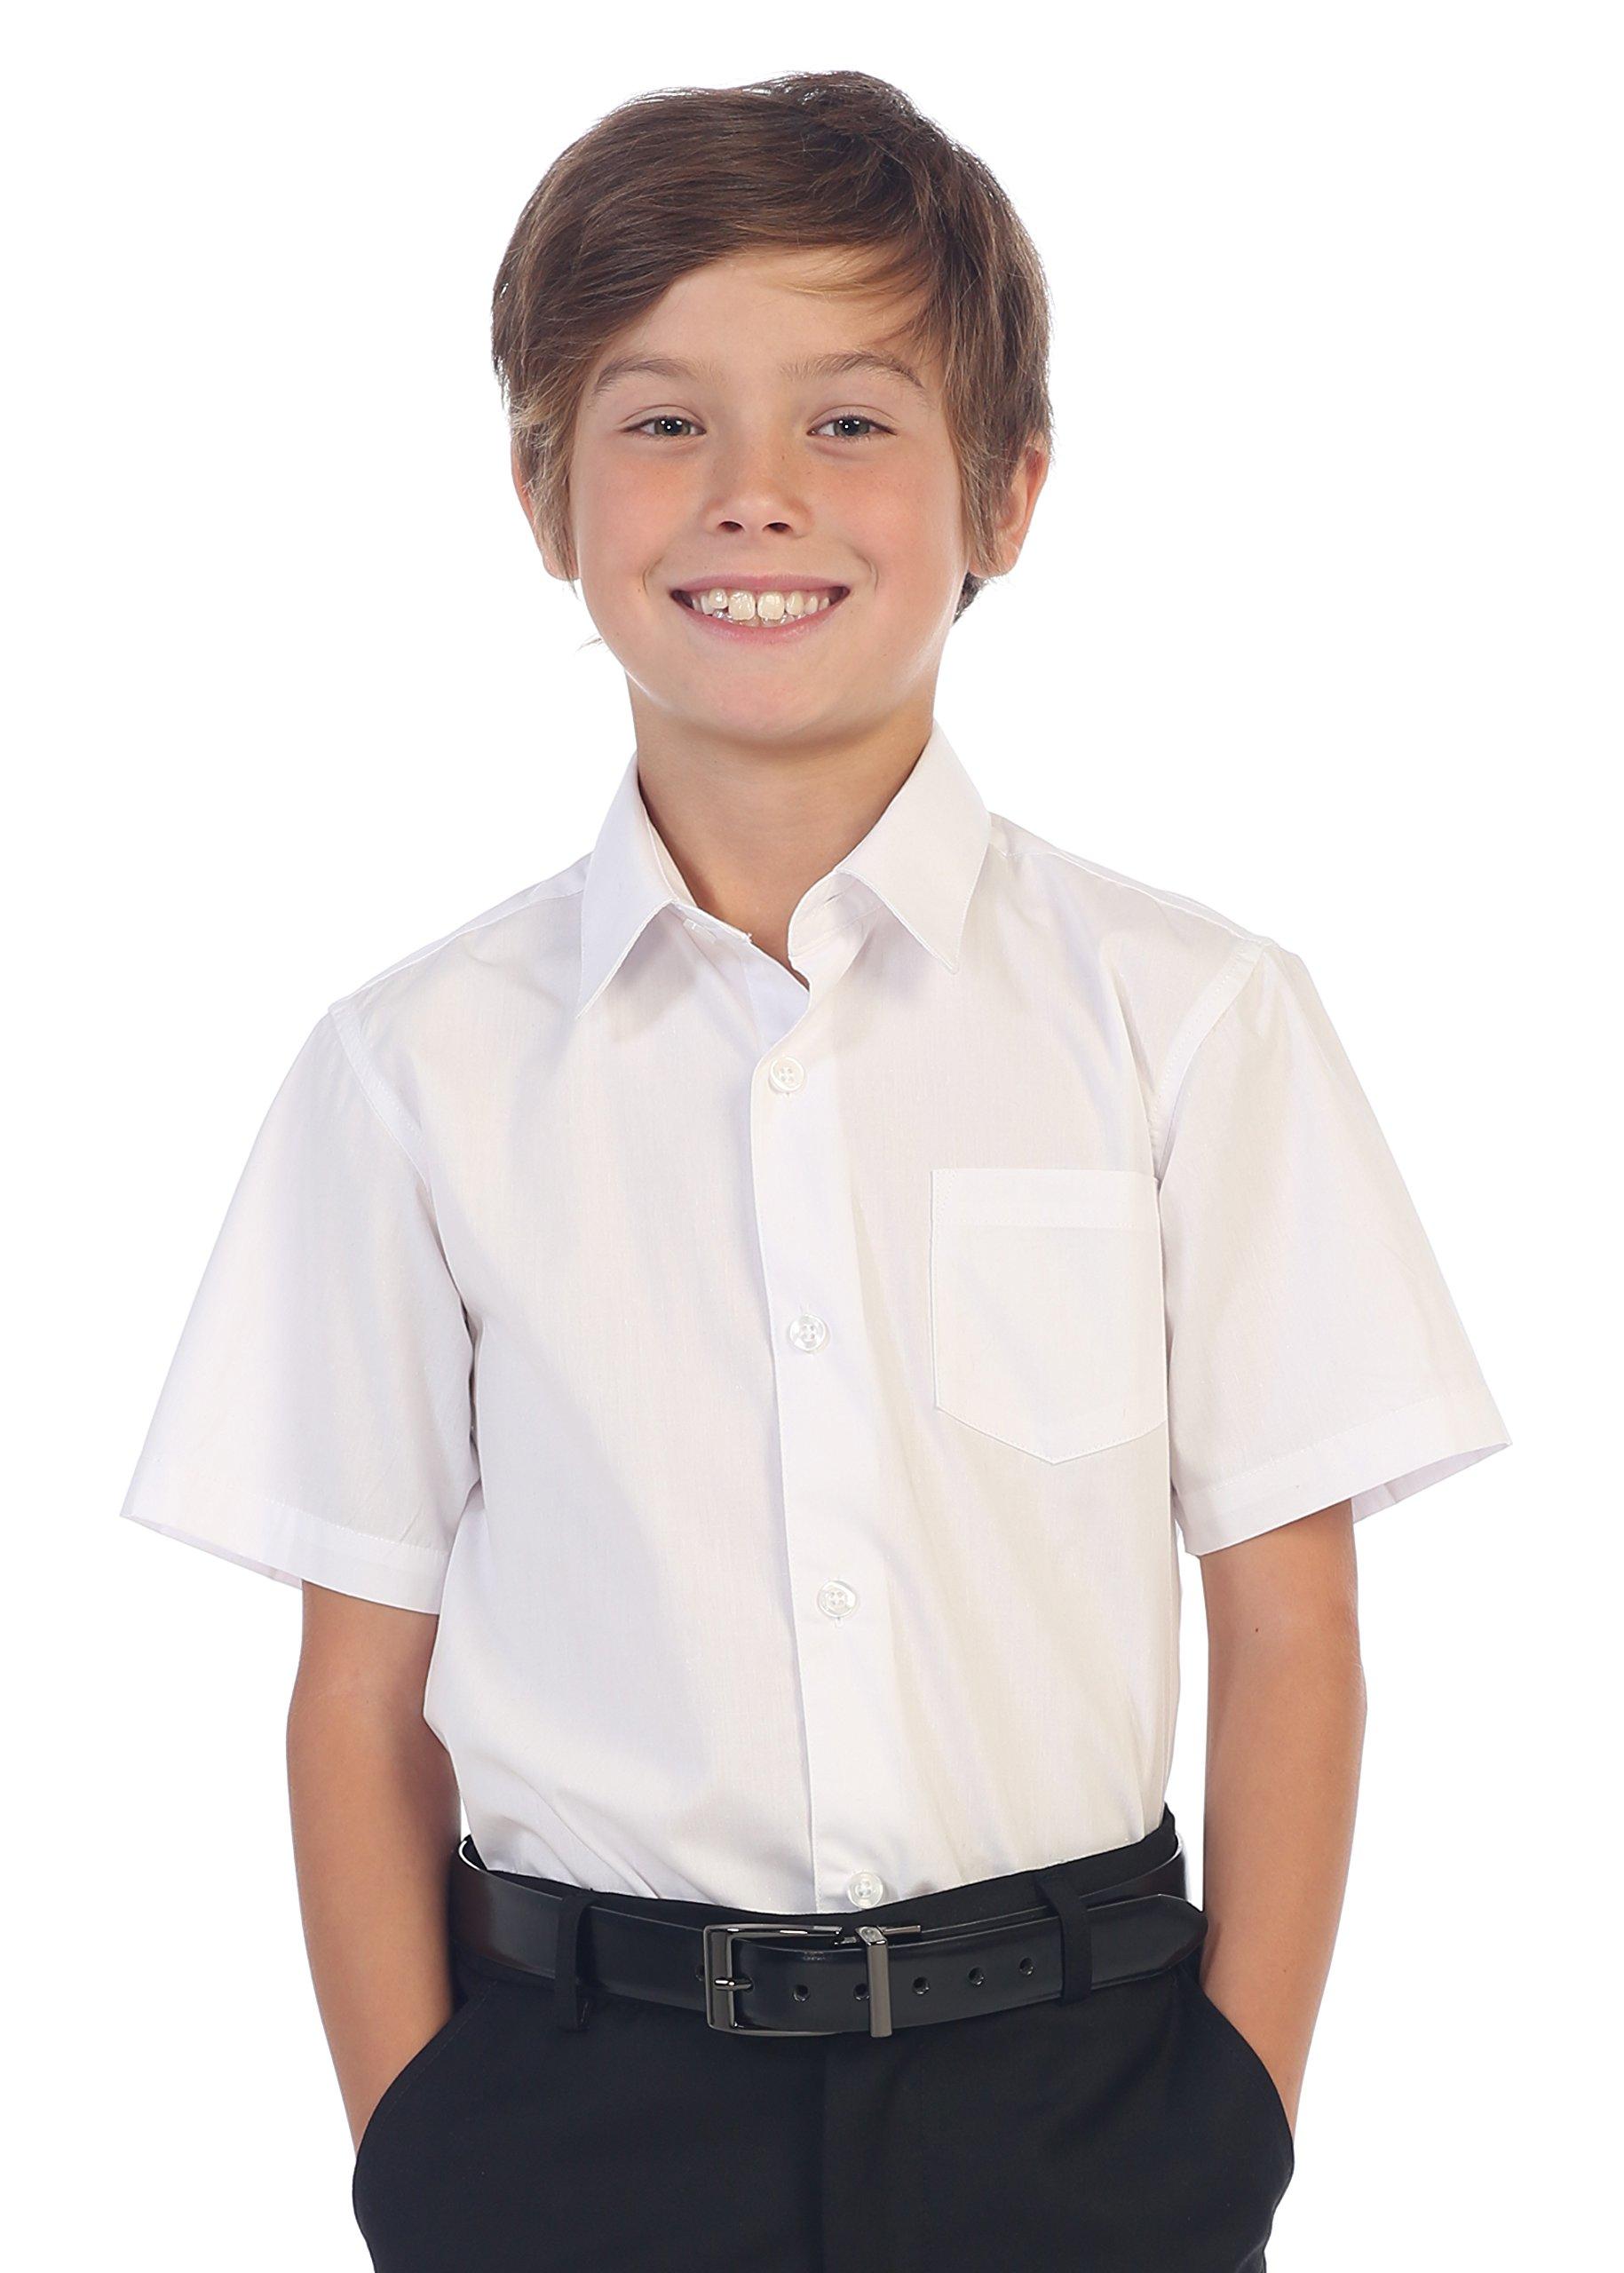 Gioberti Boy's Short Sleeve Solid Dress Shirt, White, Size 12